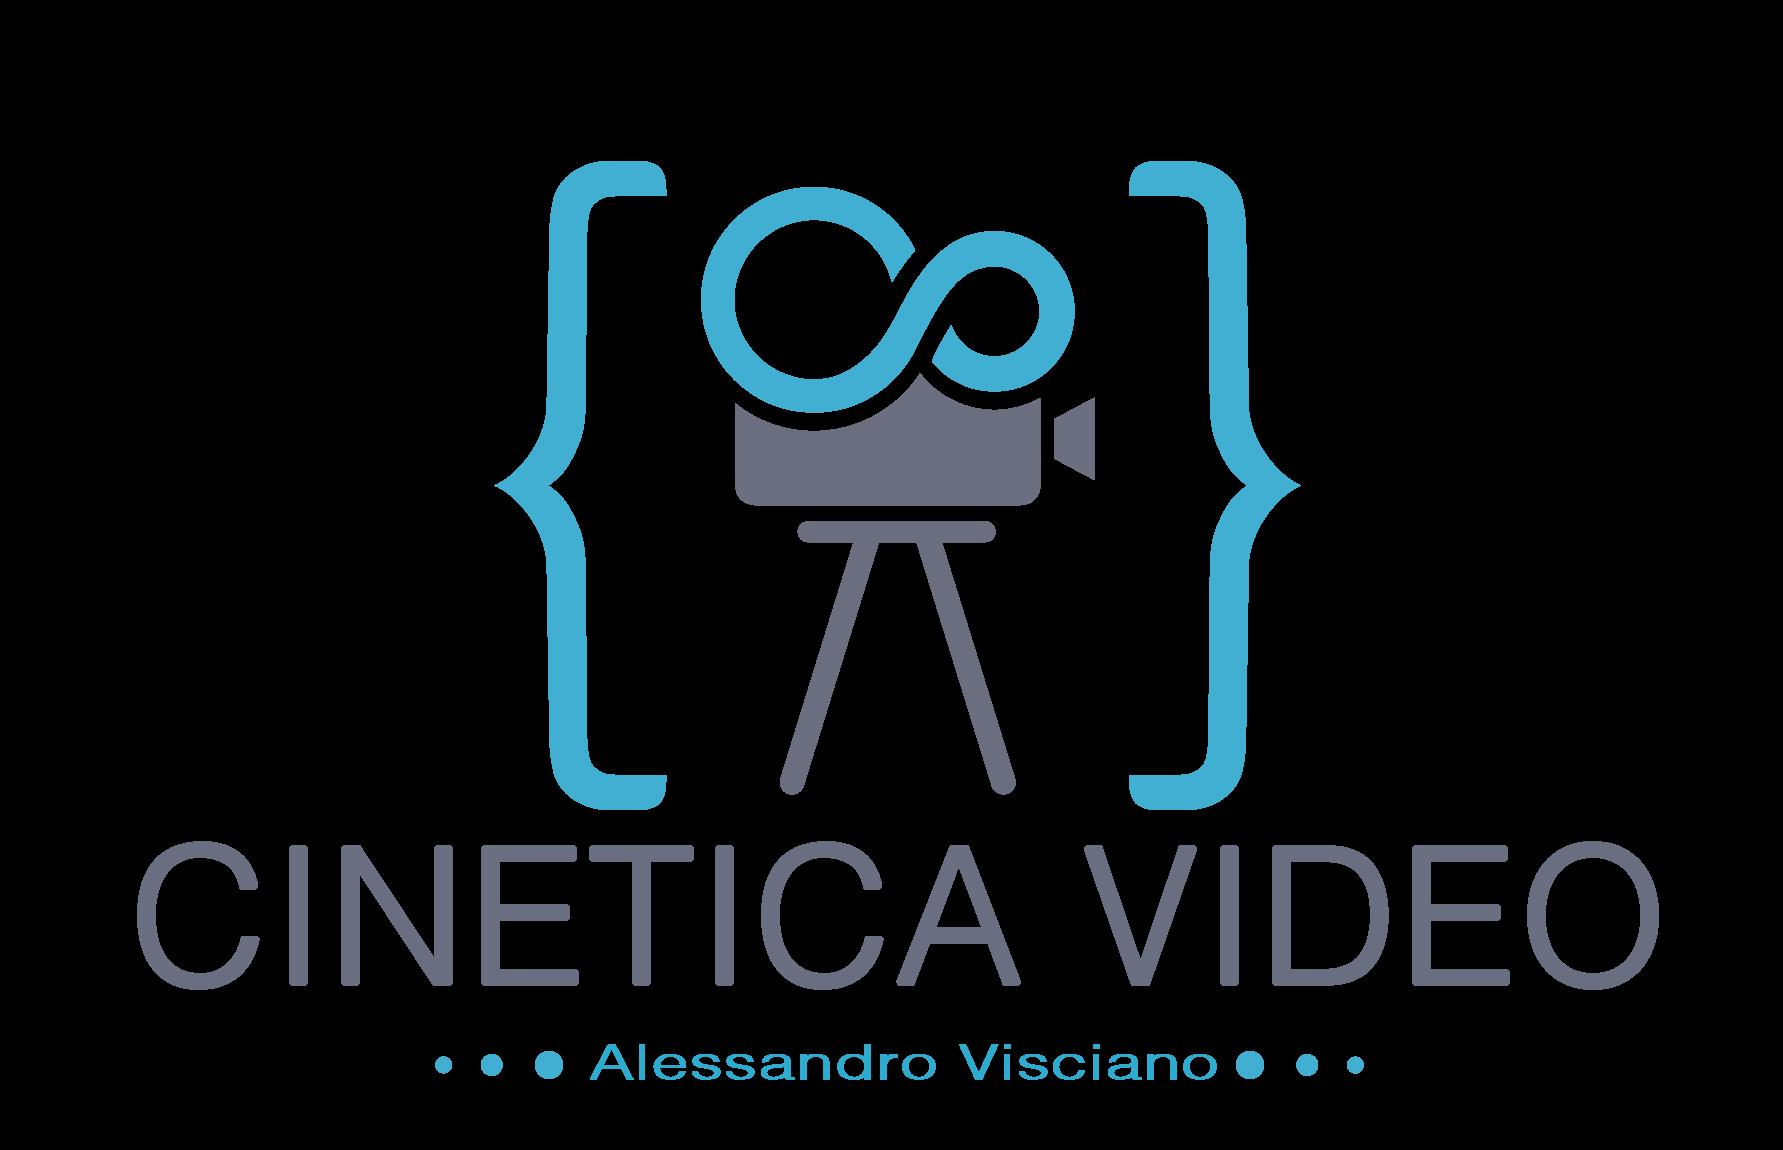 cinetica video